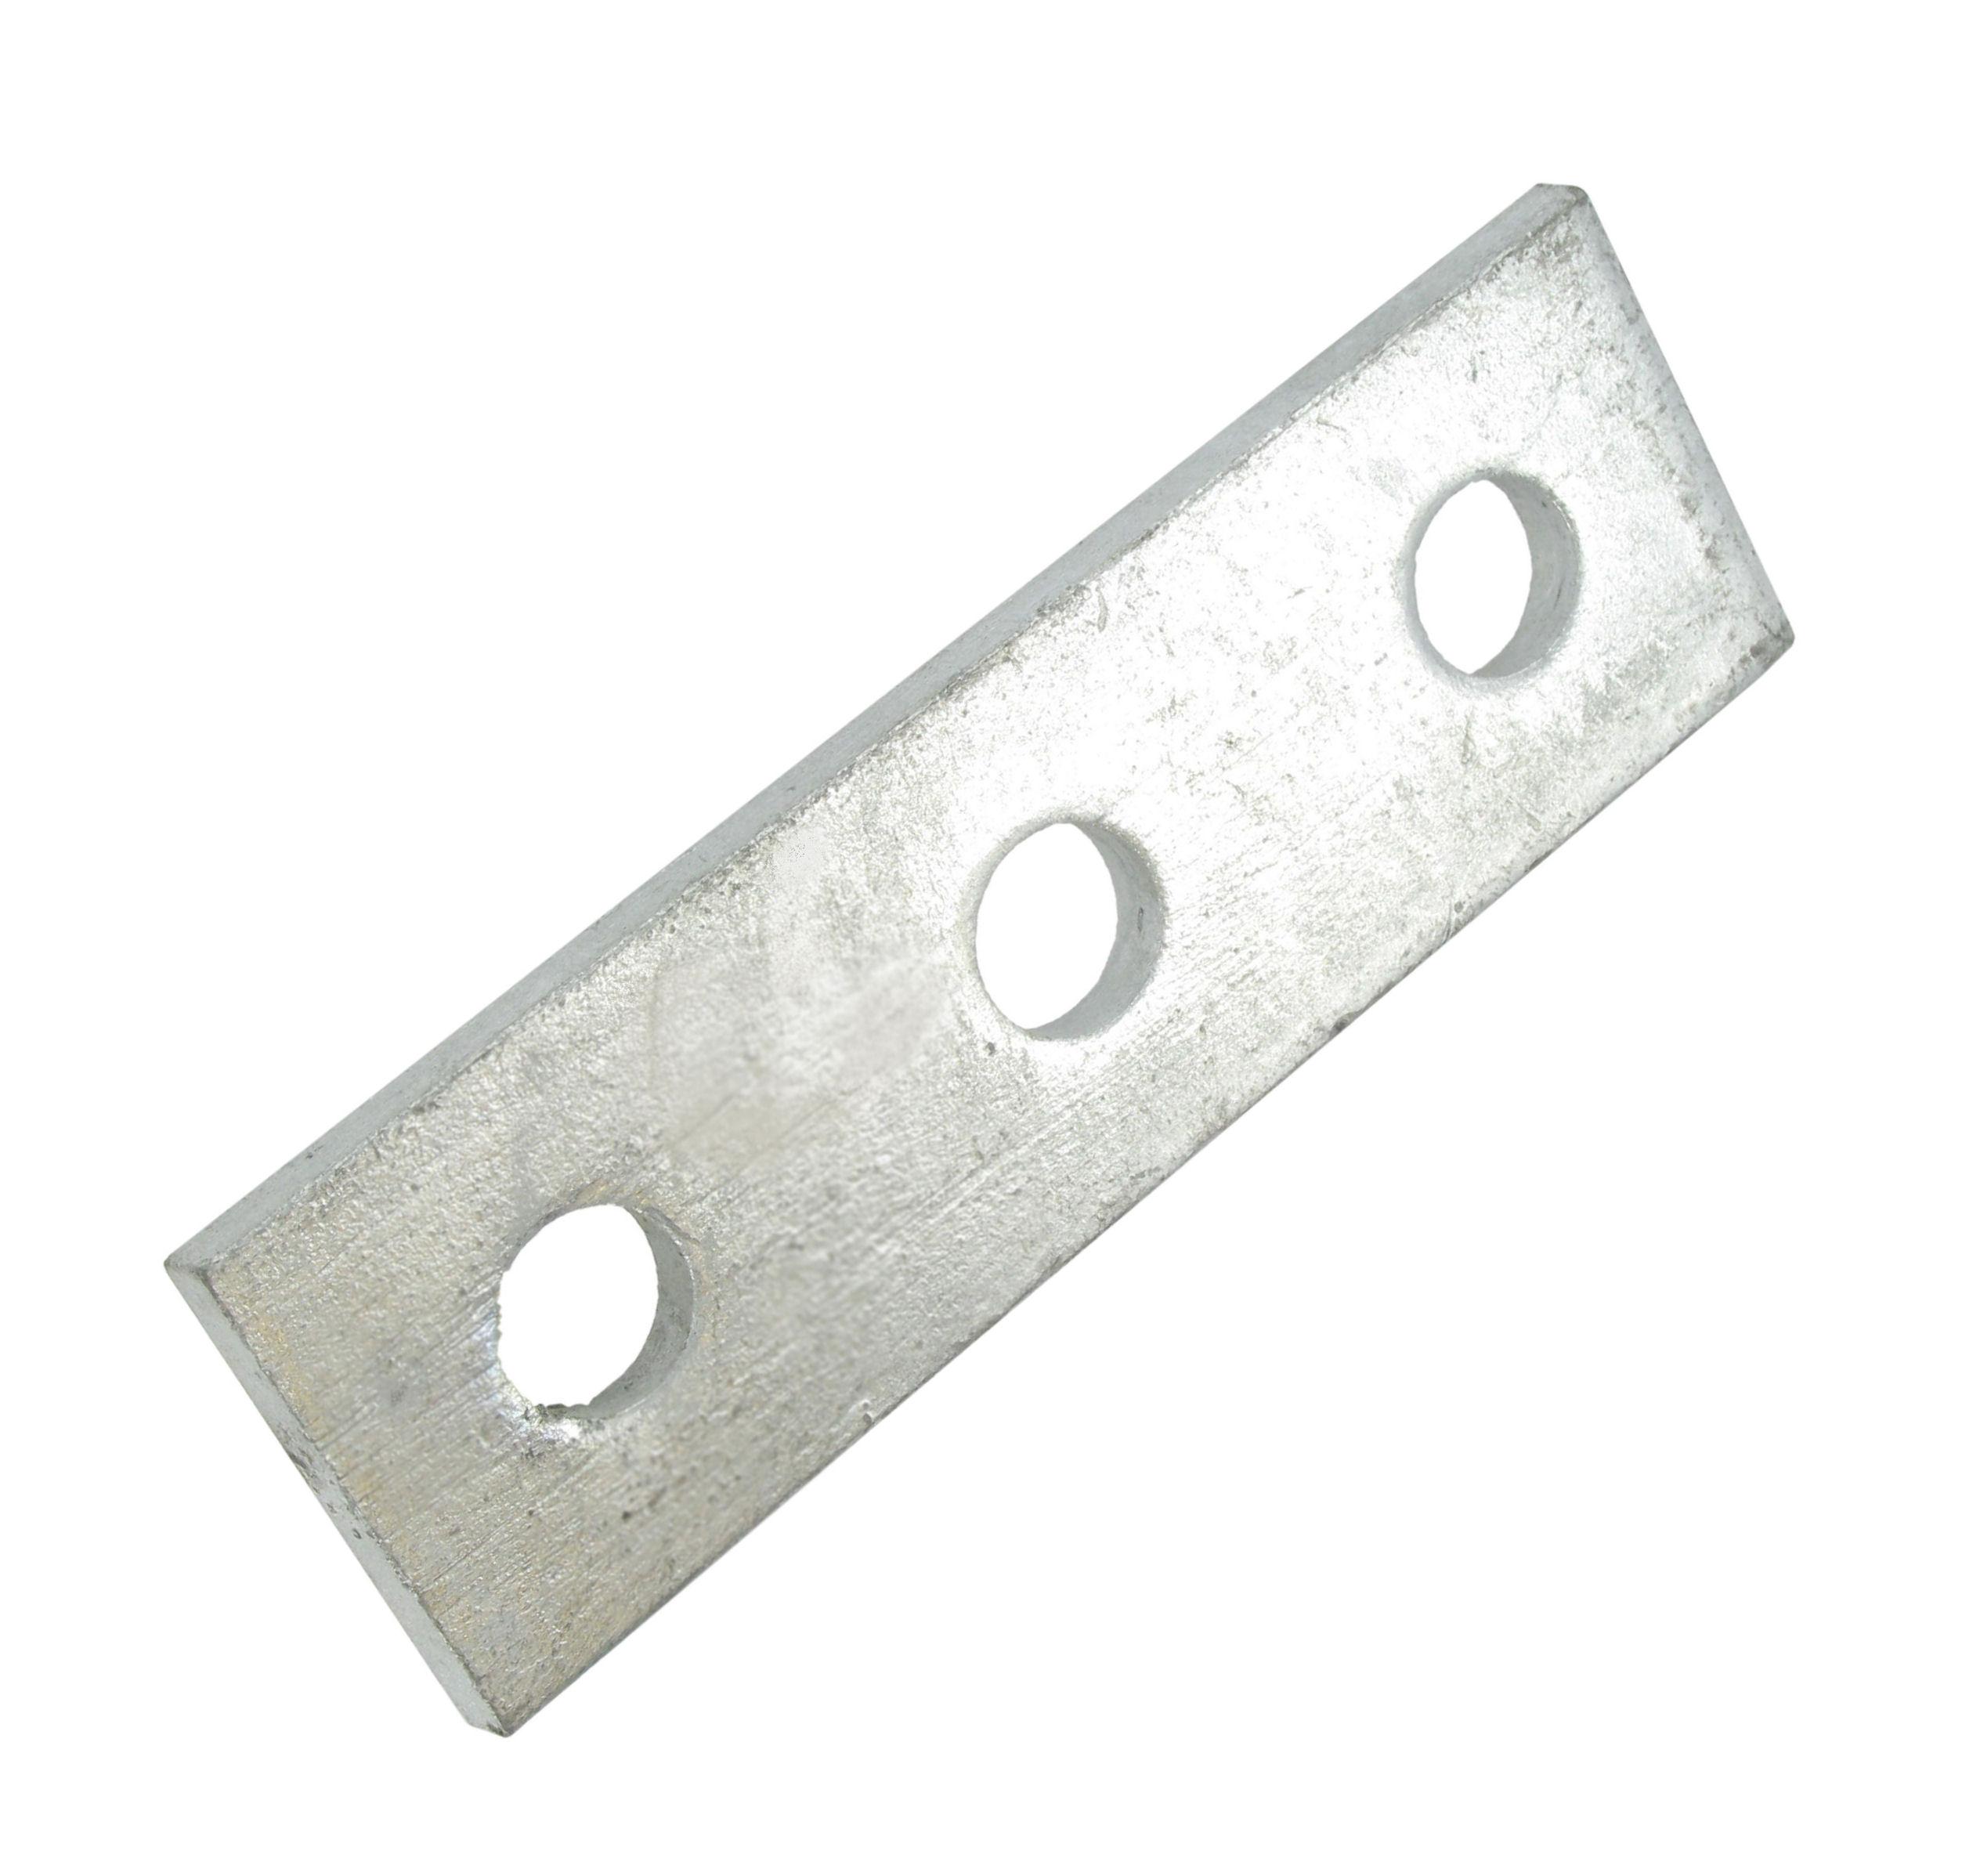 Deligo D508 Splice Plate 3 Hole Galv